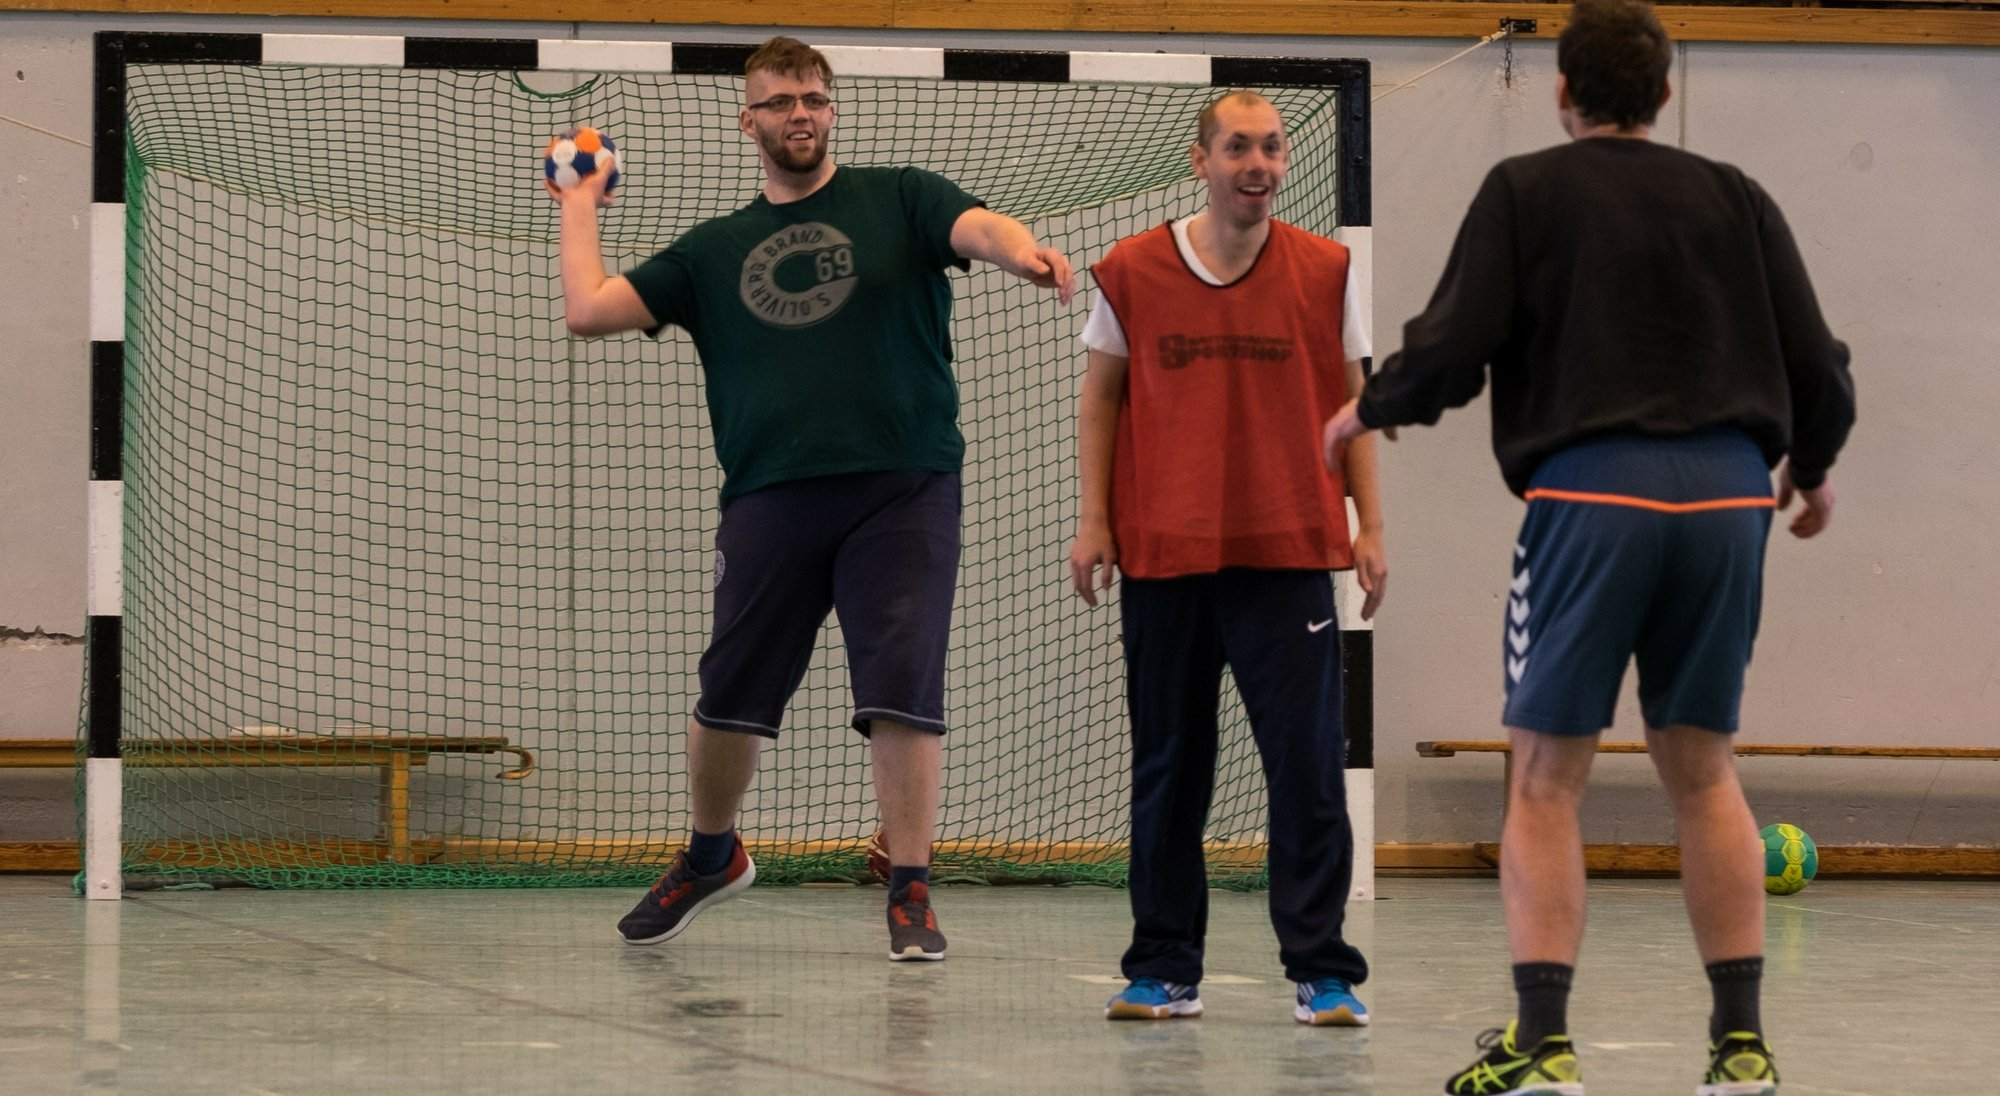 Freiwurf Hamburg – inklusiver Handballsport